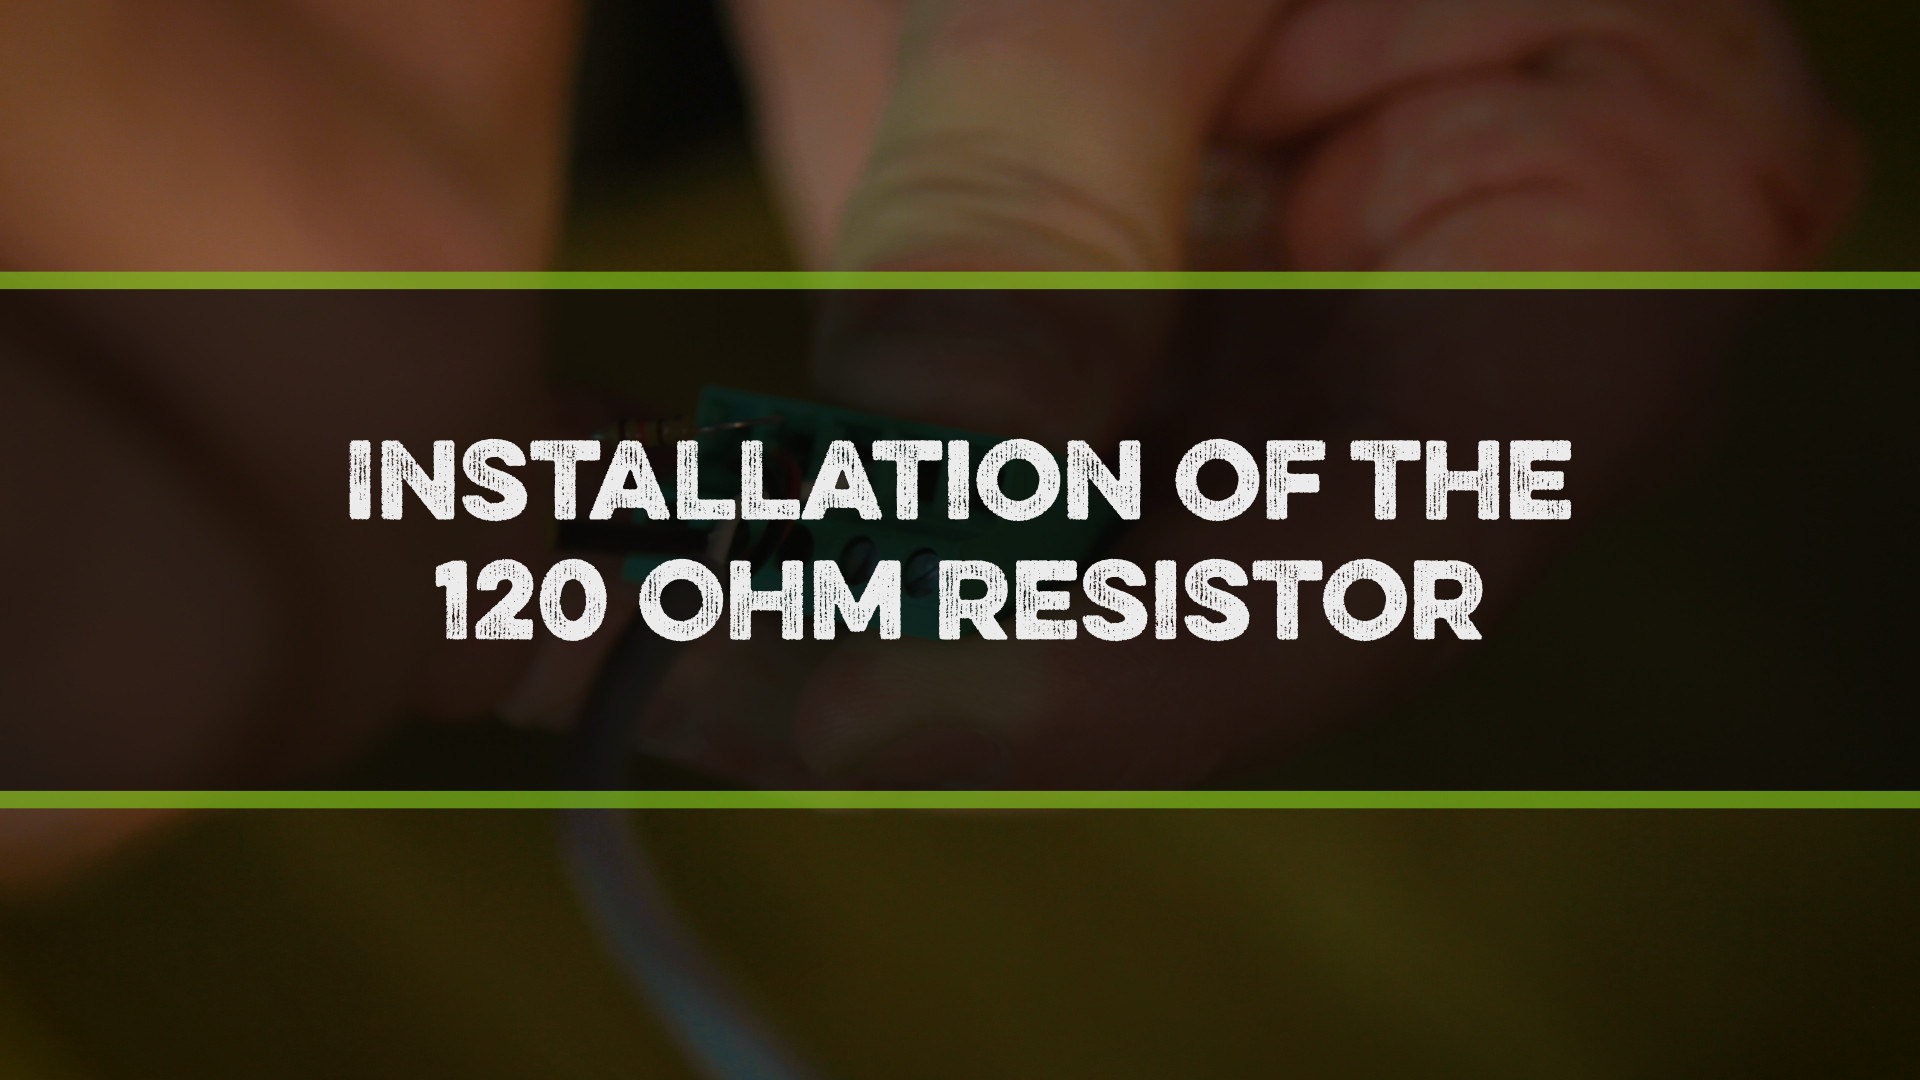 FFS Pro Installation of the 120 Ohm Resistor Video